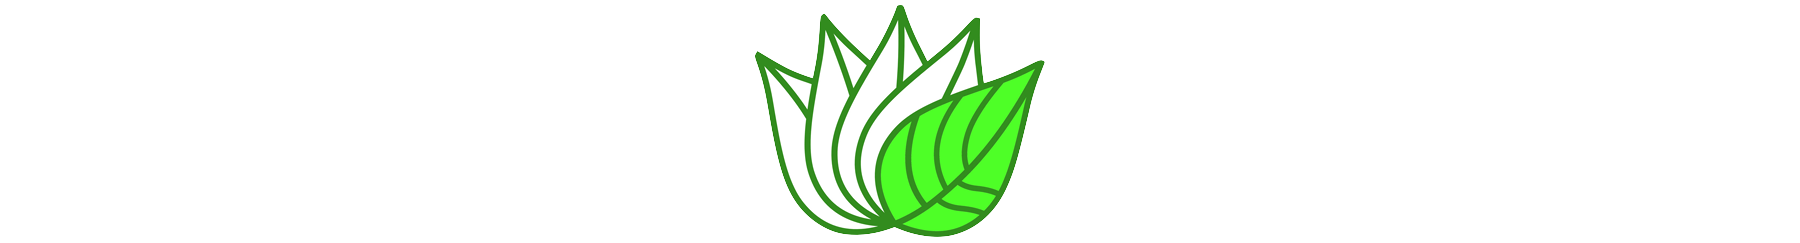 0_1 Leaf long.png